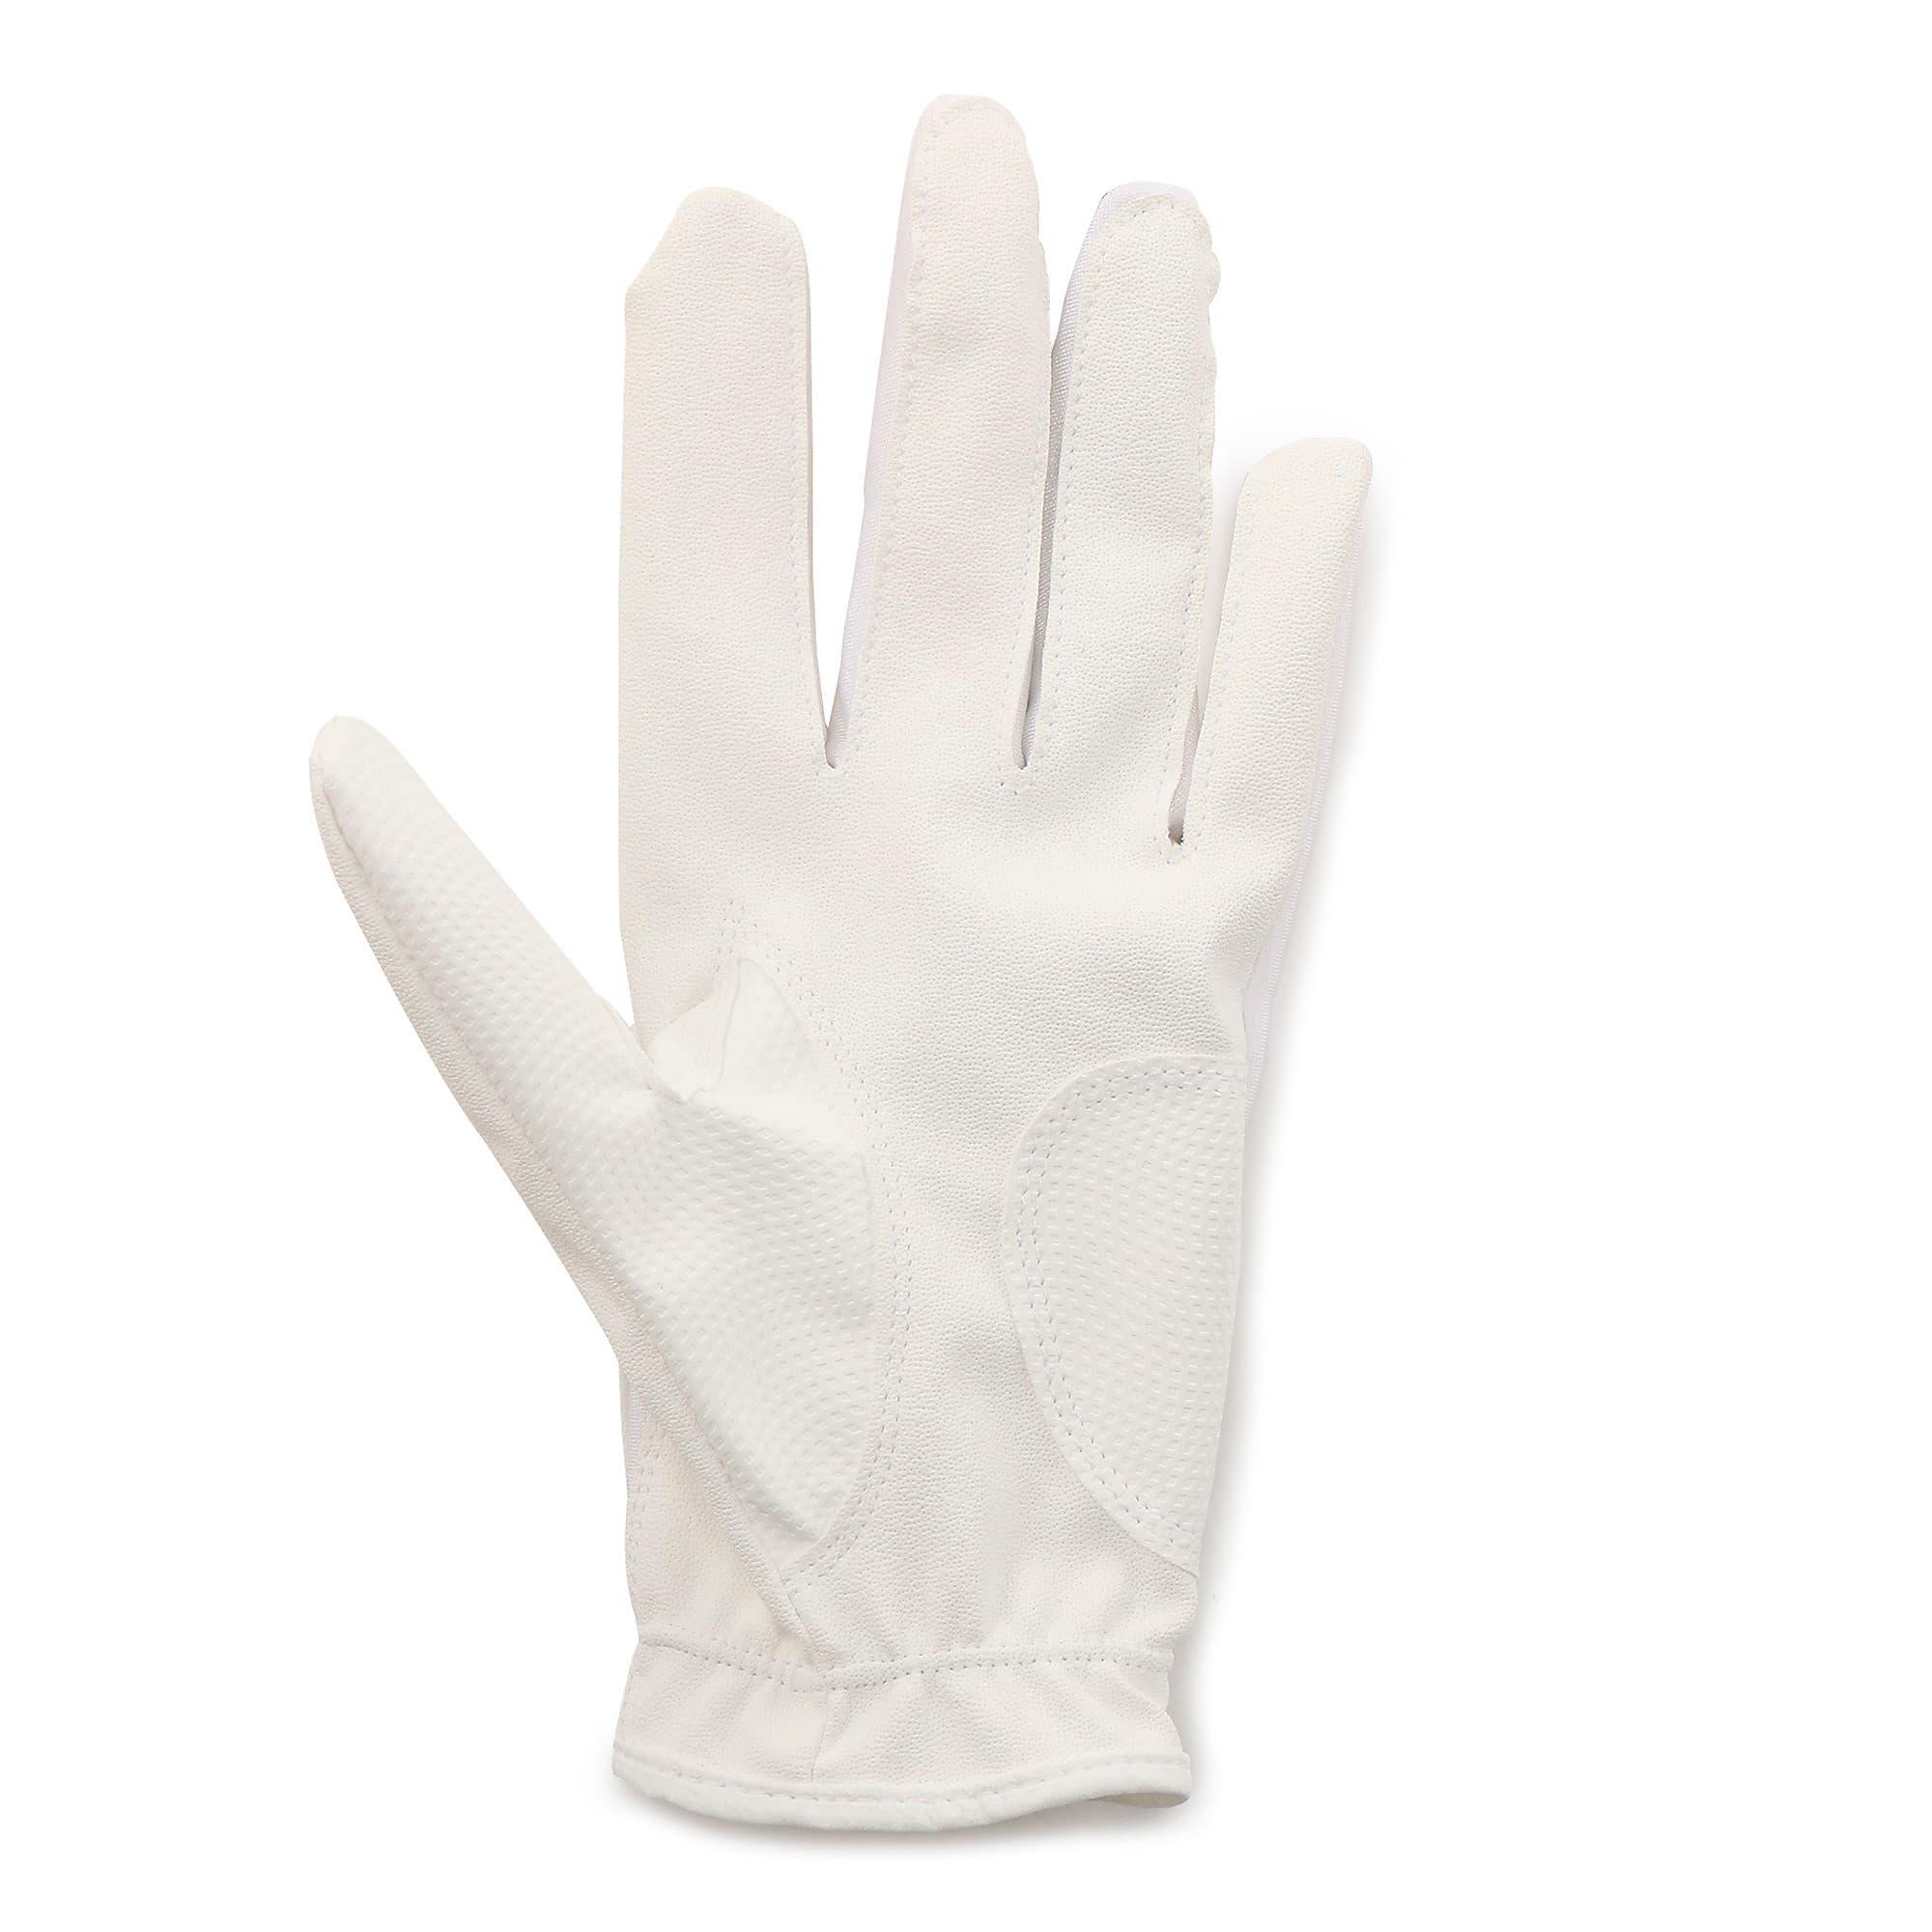 Thumbnail 2 of ゴルフ 3D ウィメンズ パフォーマンス グローブ 両手用, White / White, medium-JPN